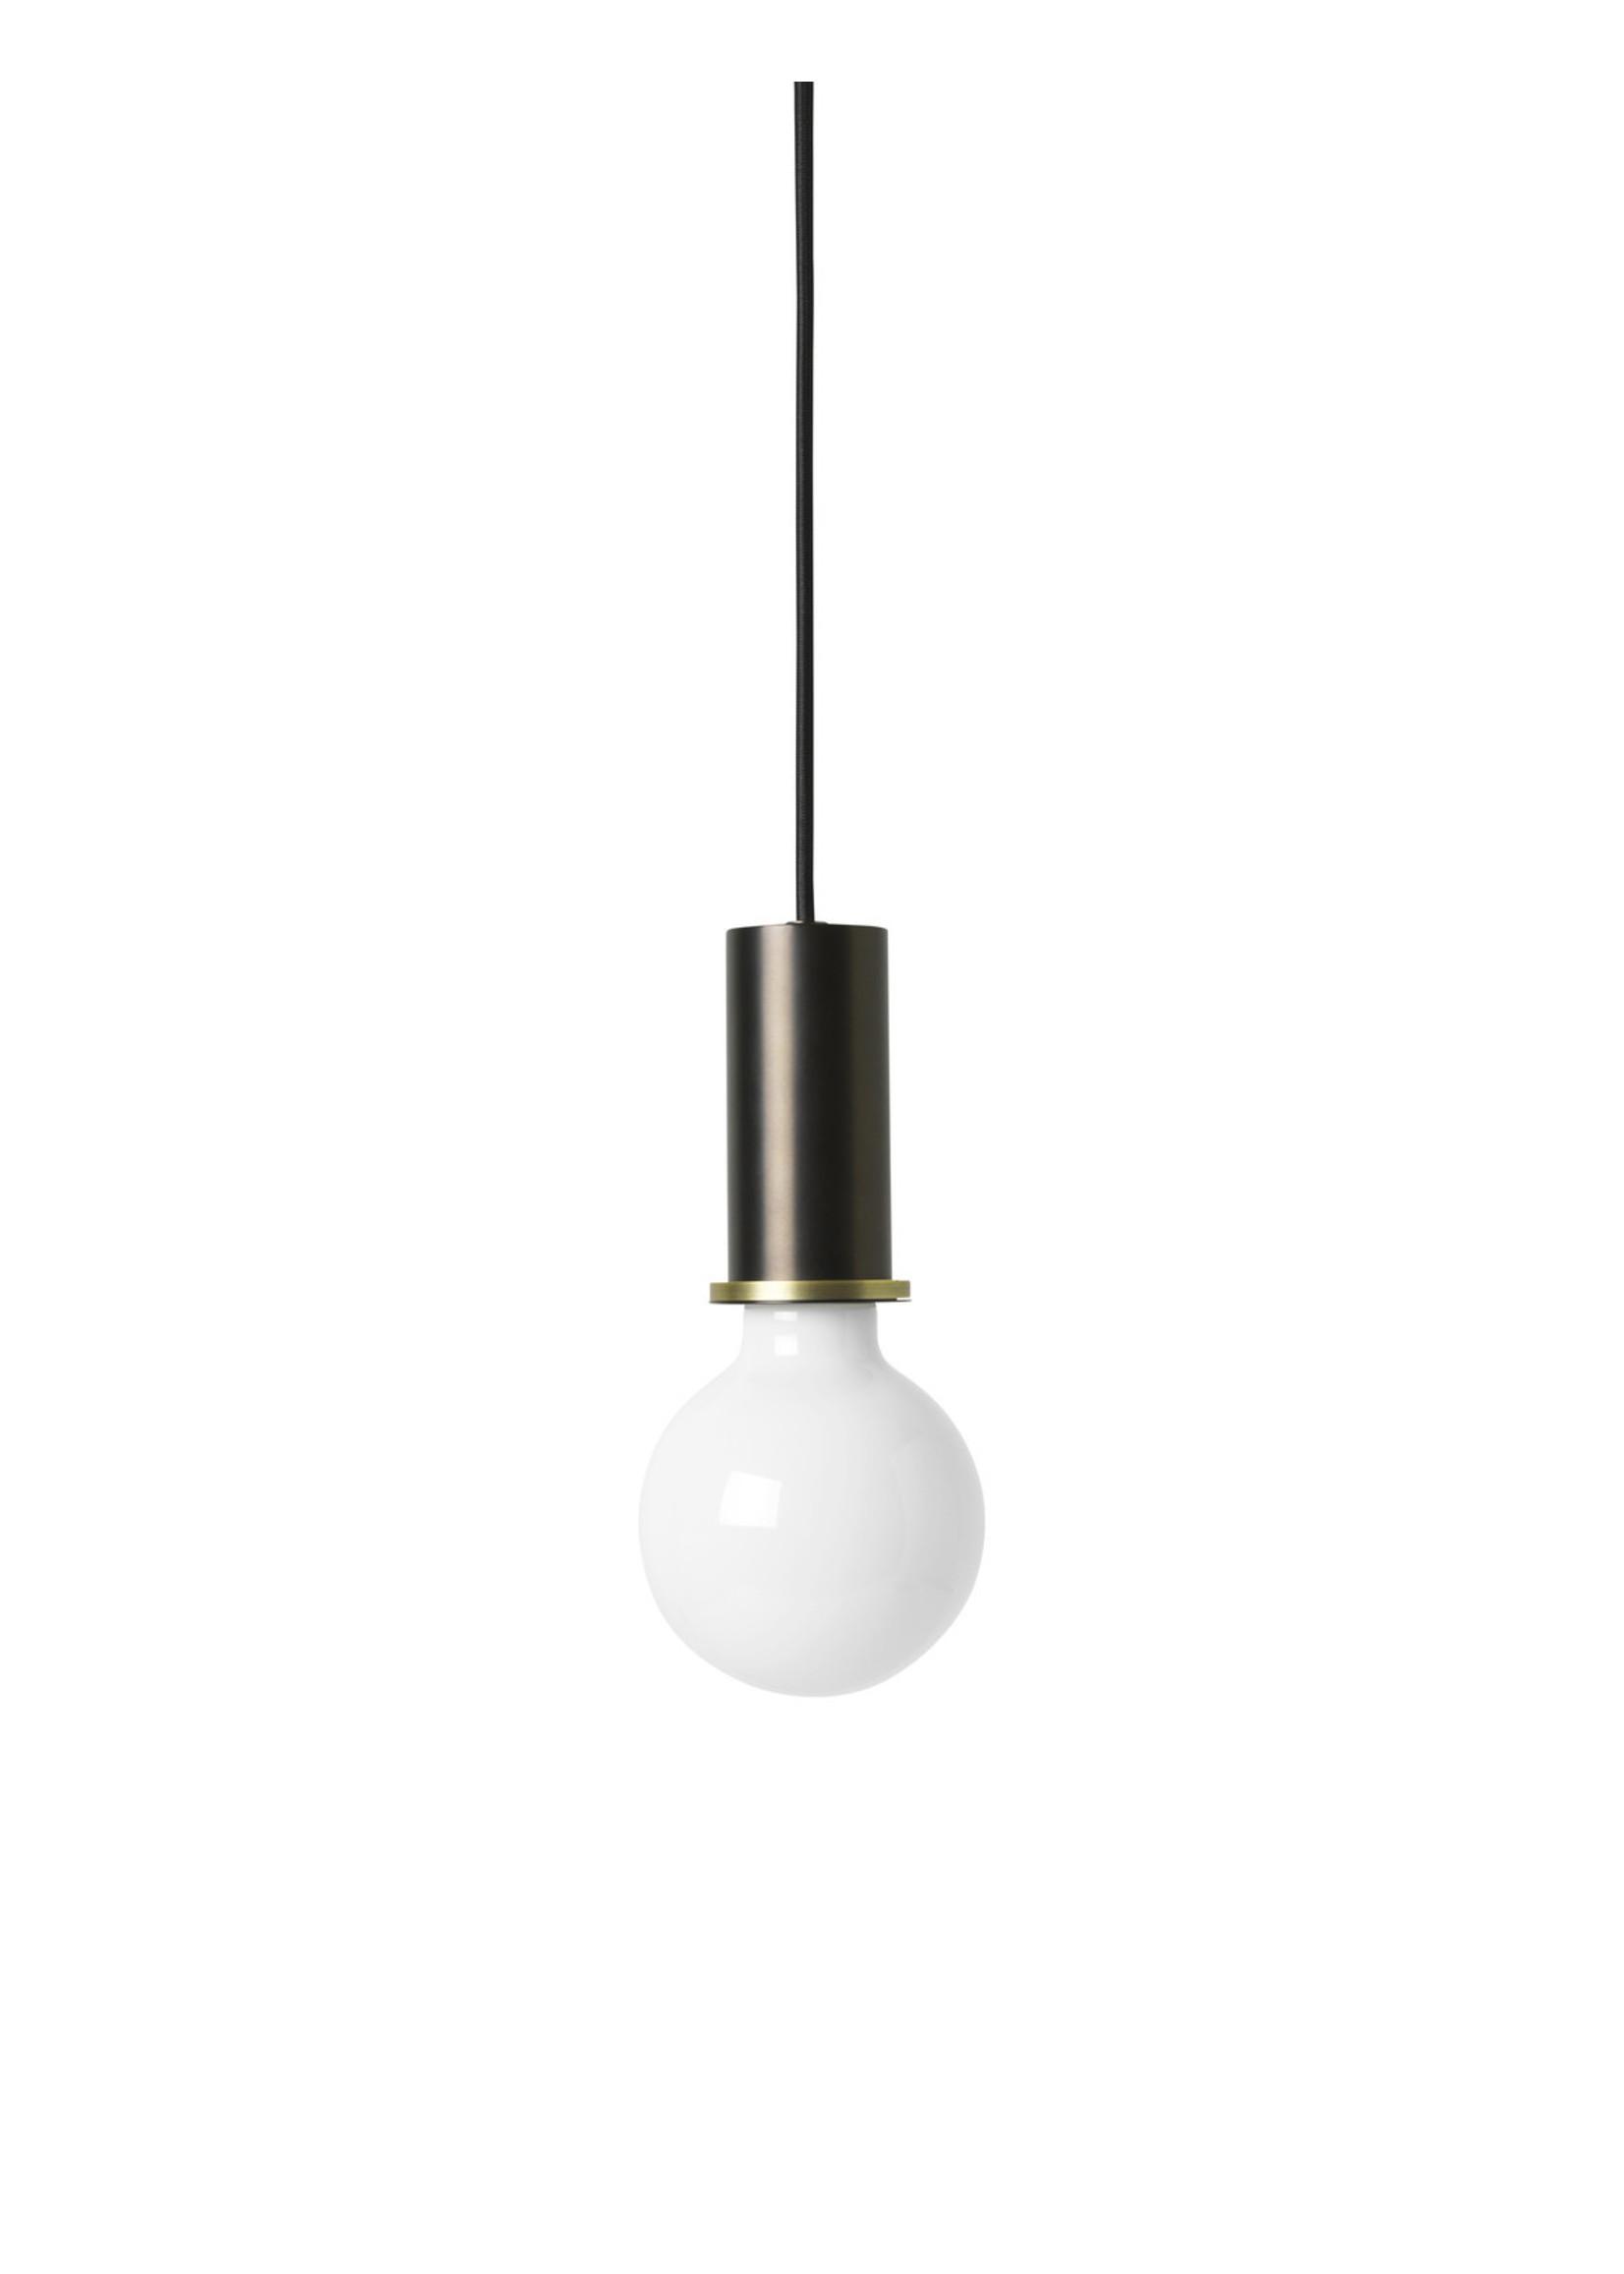 ferm LIVING ferm LIVING Lighting - Socket Pendant Low - Black Brass